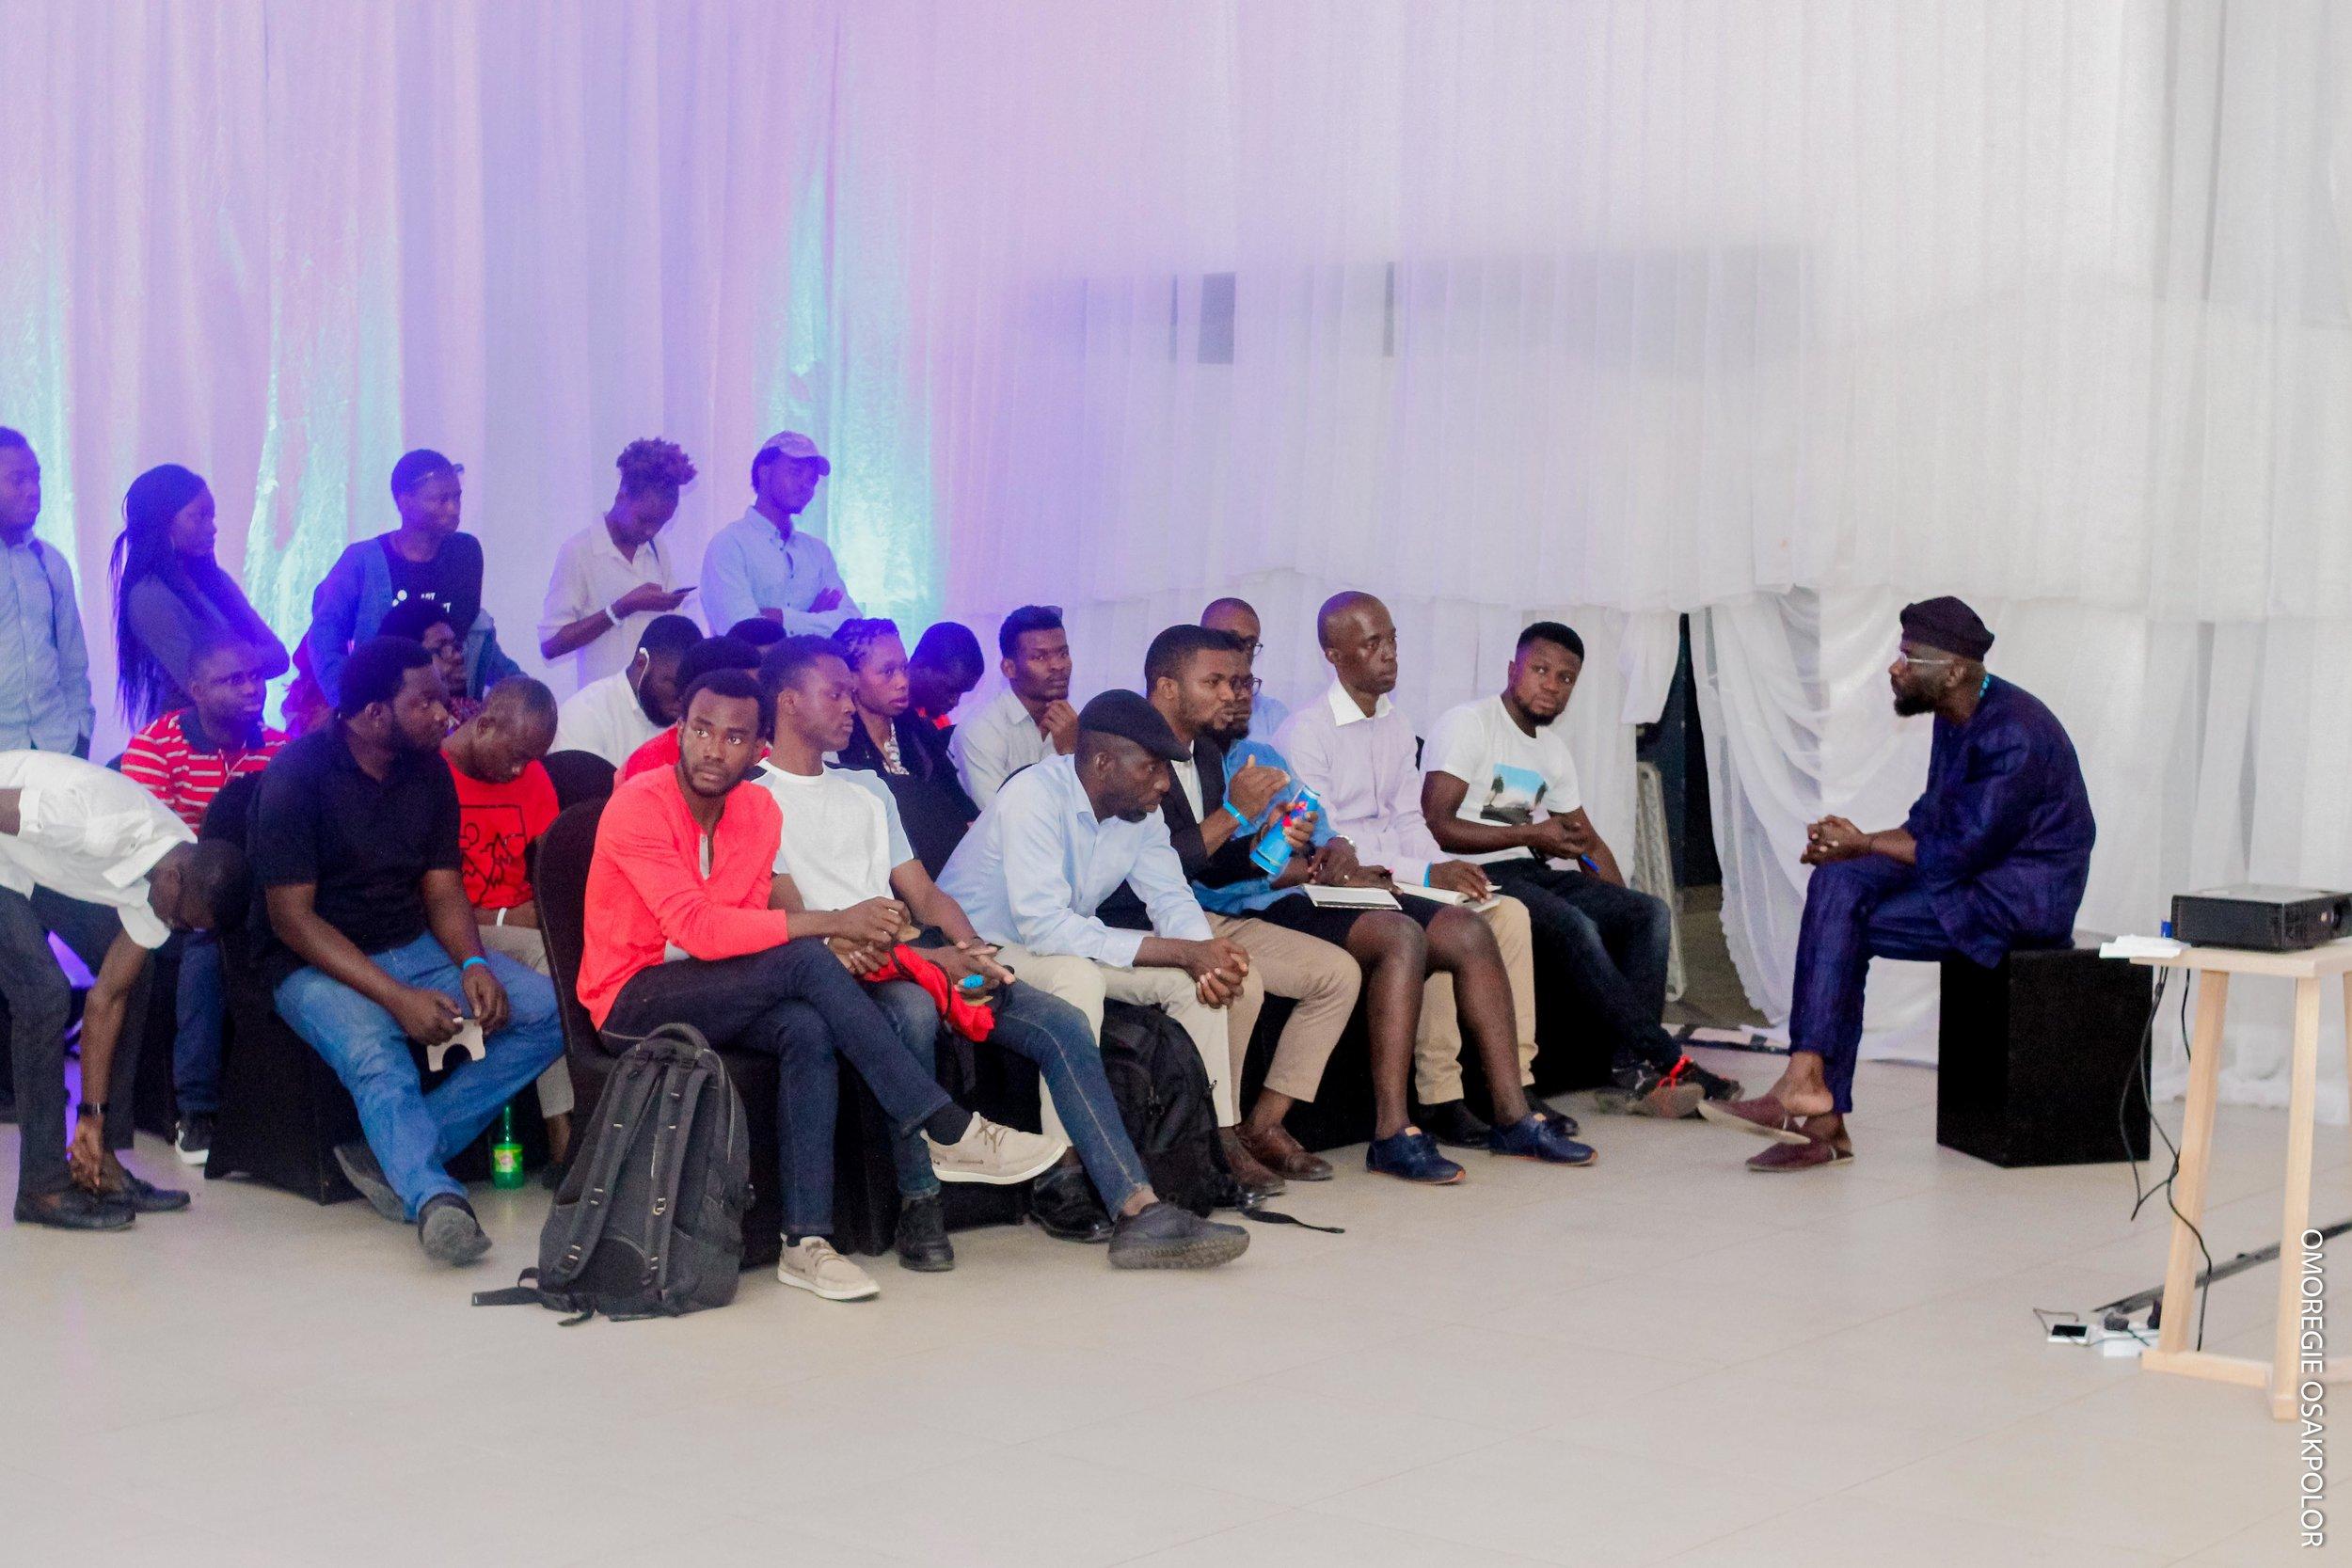 Omoregie Osakpolor_Displaced_Lagos_2017-2018_MG_6609.JPG